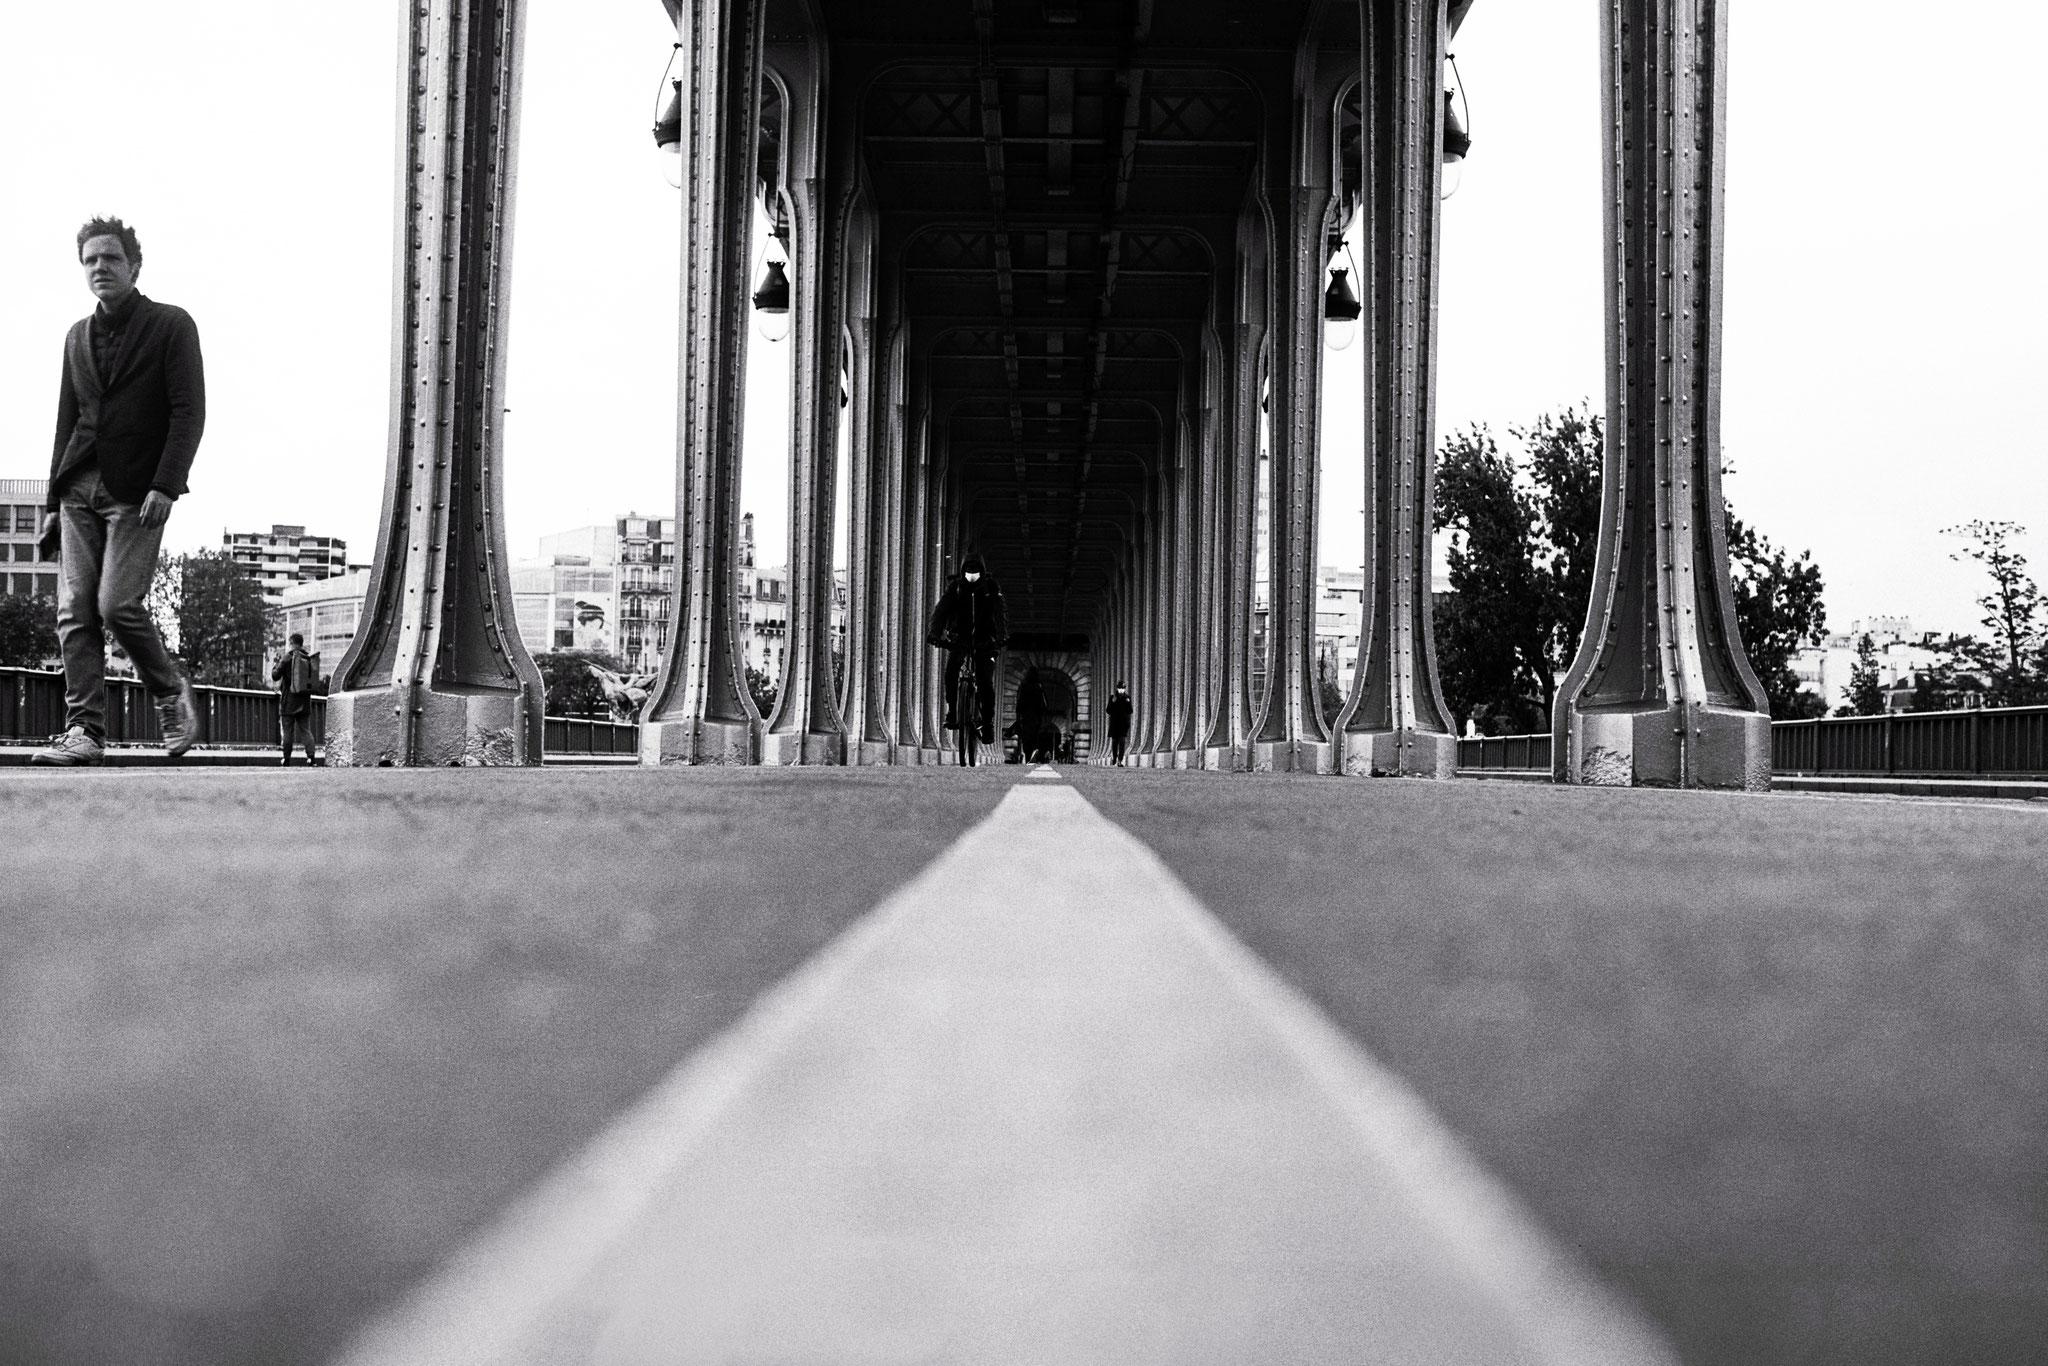 """No limit"" - Pont de Bir-Hakeim, Paris (2021). Rollei Blackbird Creative 64 ASA. © Clémence Rougetet"